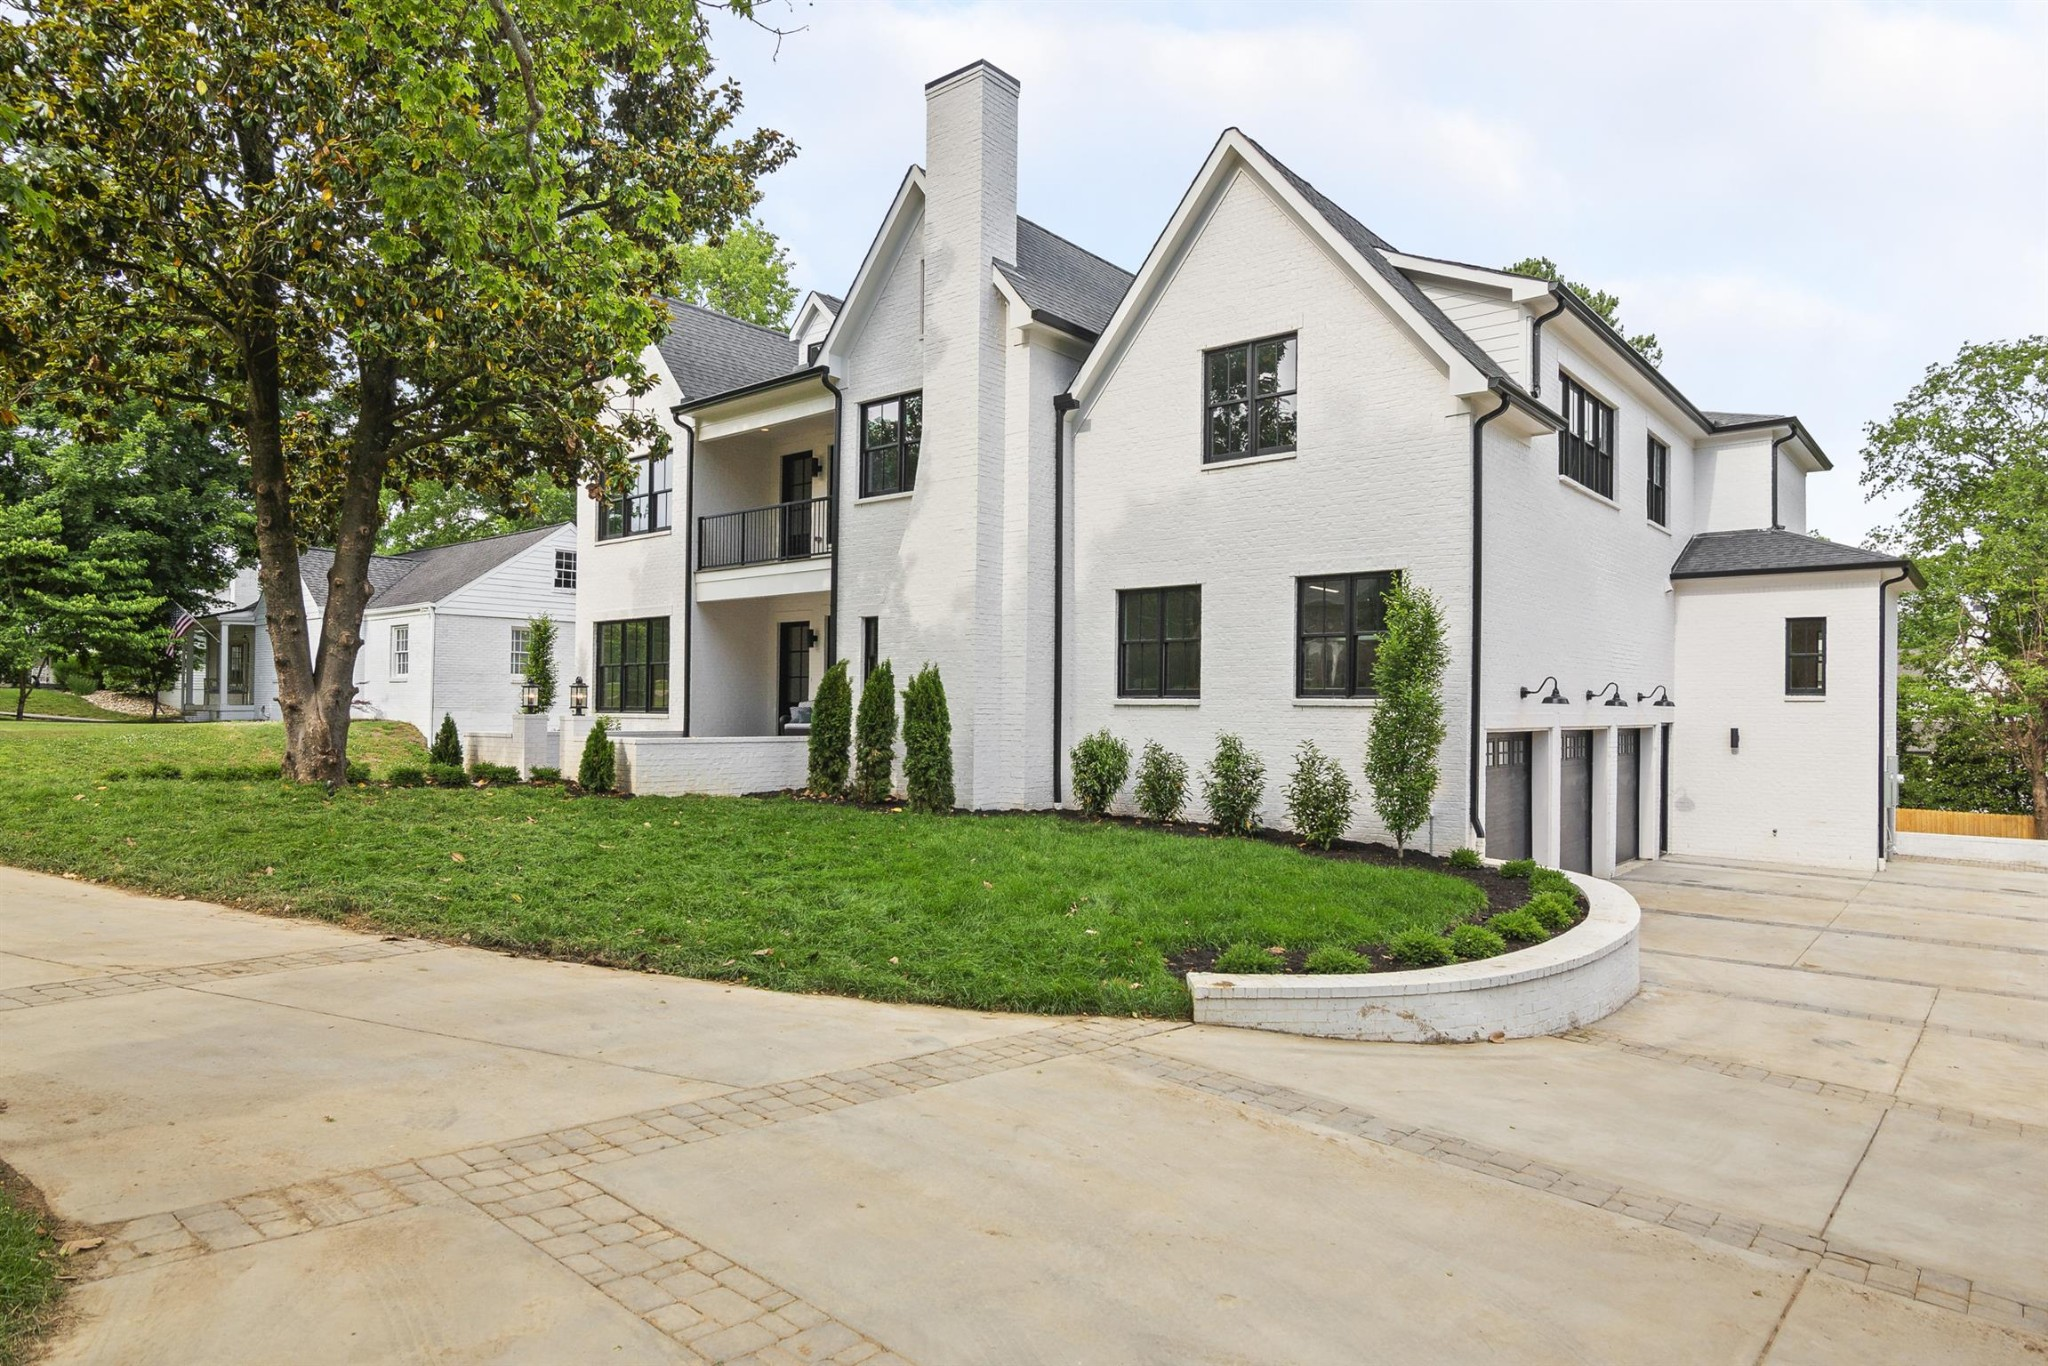 4012 Estes Rd, Nashville, TN 37215 - Nashville, TN real estate listing